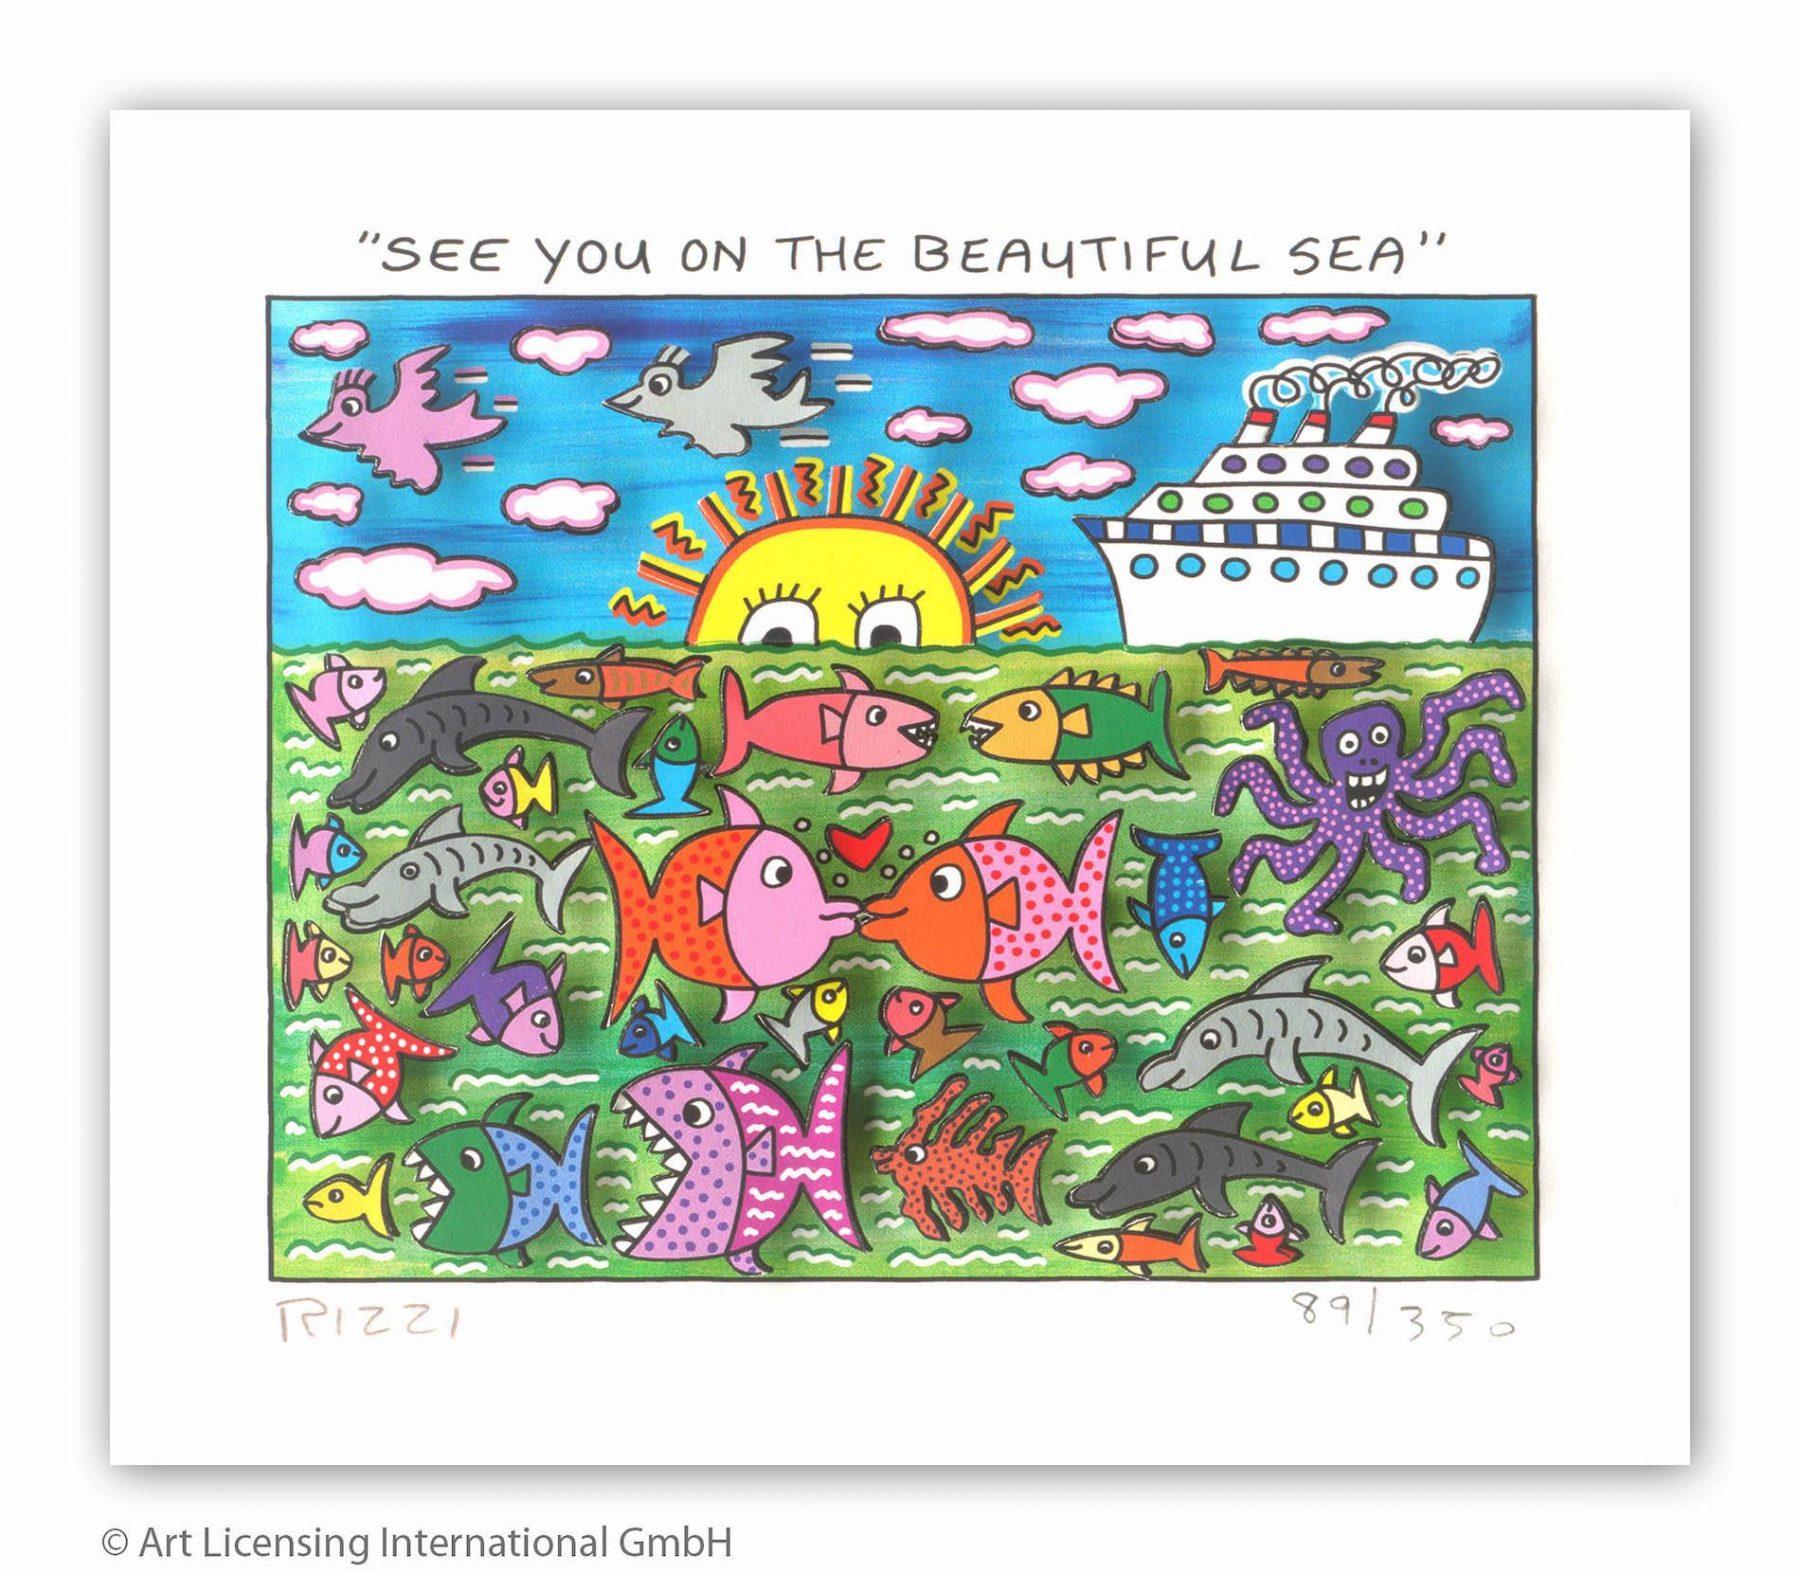 See you on the beautiful sea - Rizzi, James - k-2108RIZ5